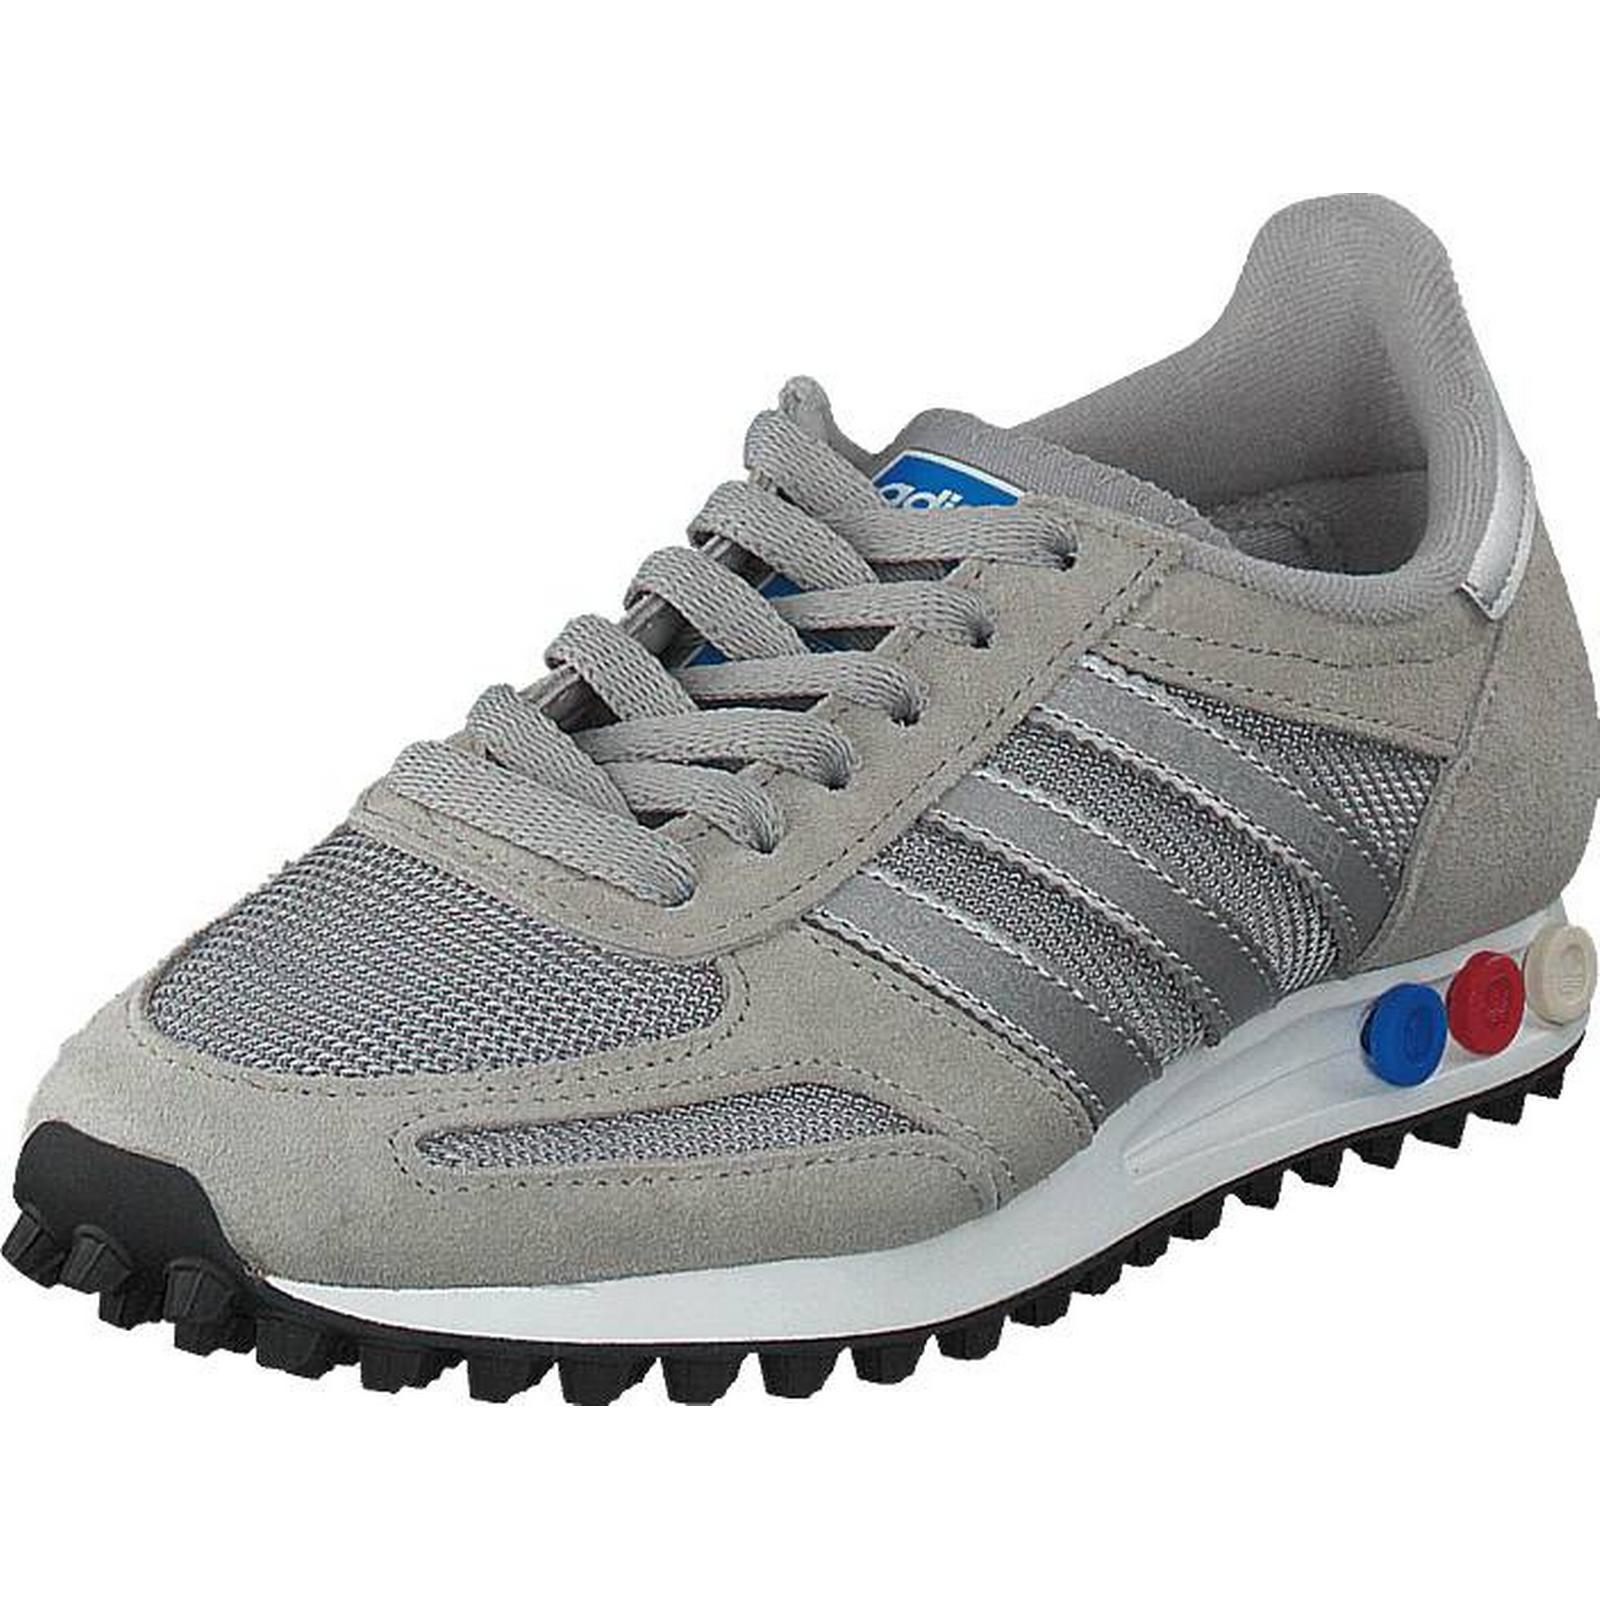 Adidas Originals La Trainer Trainer La Mgh Solid Grey/MetSilver/White, Shoes, Trainers & Sport Shoes , Trainers, Grey, Unisex, 37 7348b6